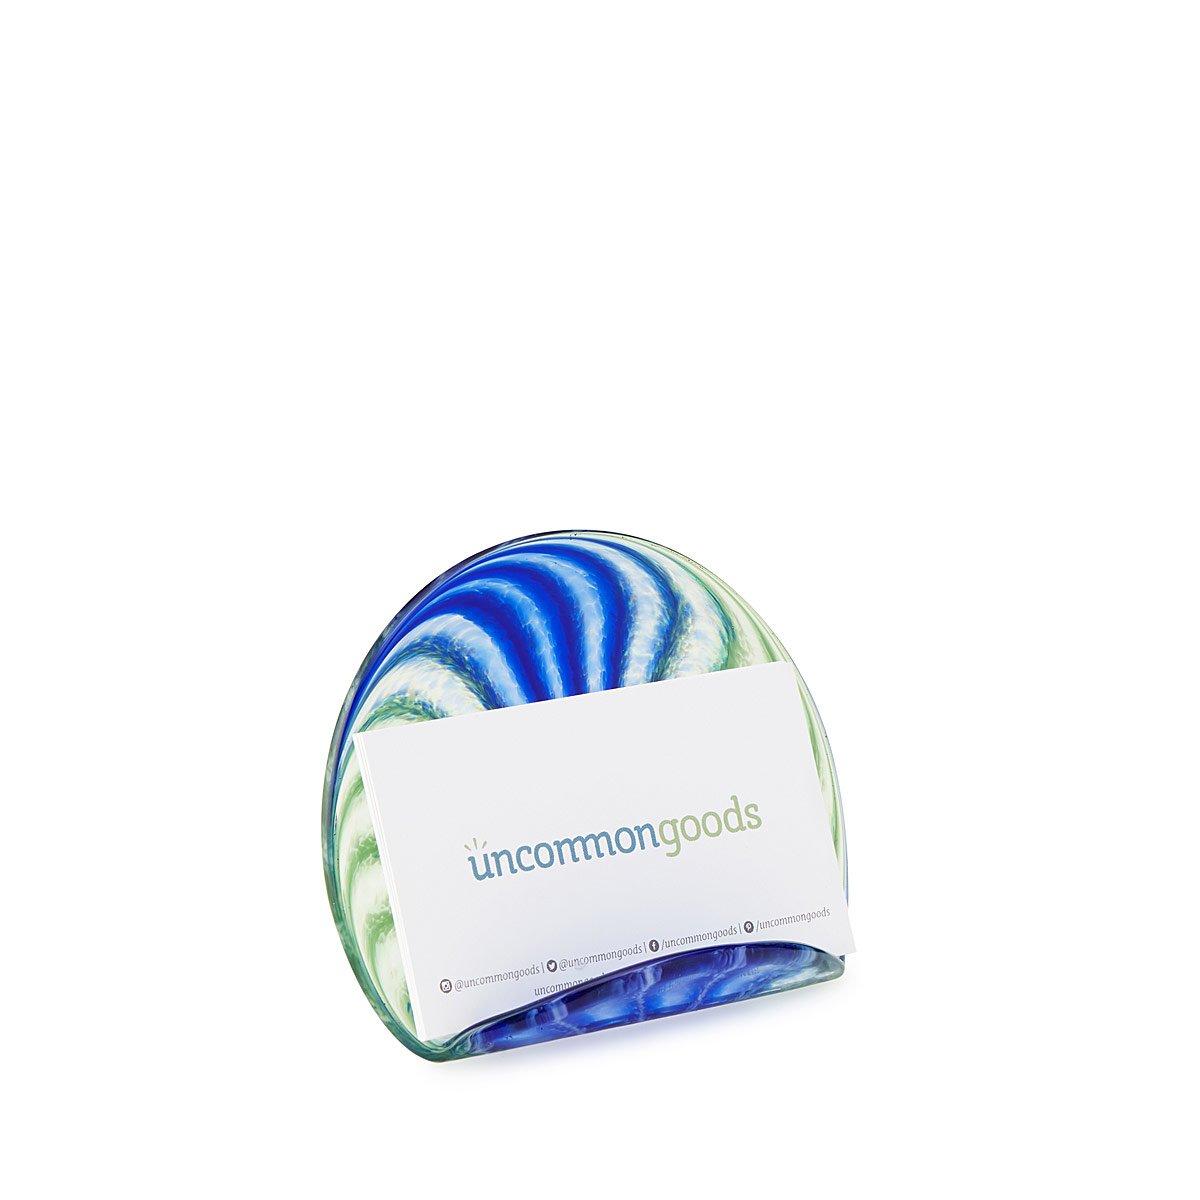 Hand Blown Glass Business Card Holder | Office Desk Gifts ...